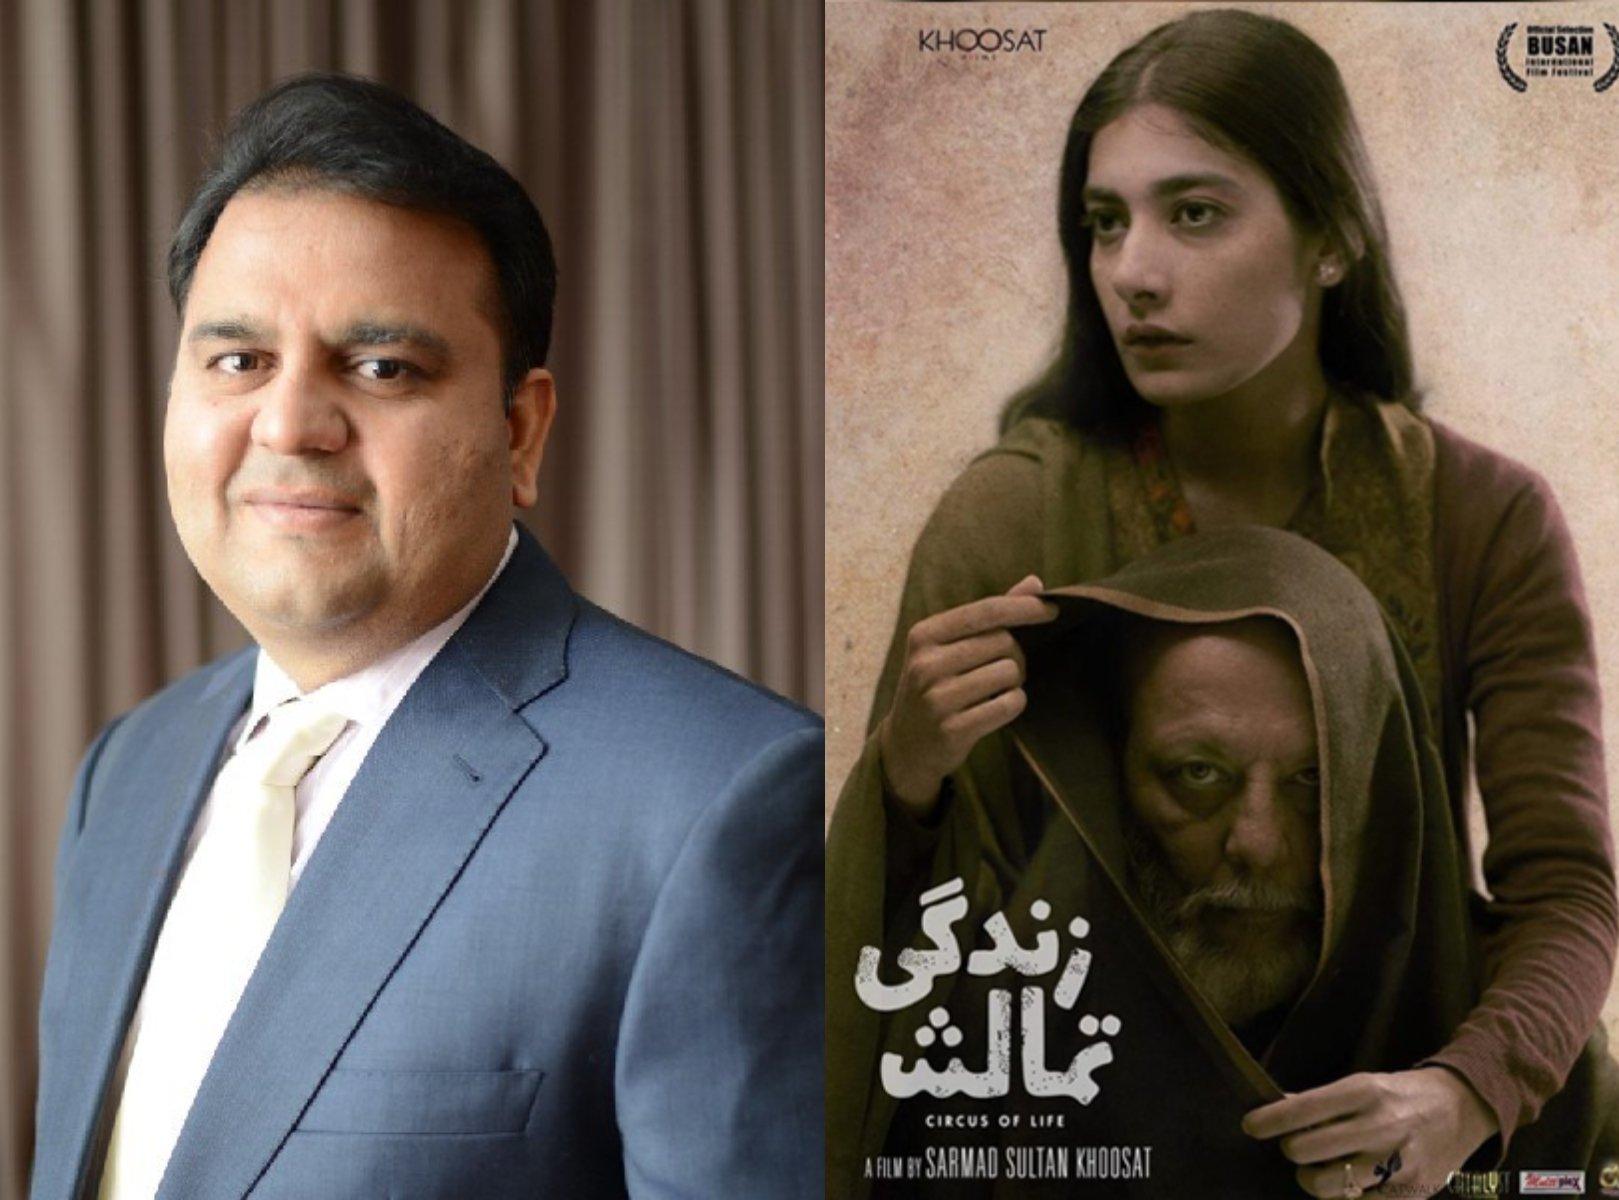 fawad chaudhry s praise for meray paas tum ho raises questions about zindagi tamasha